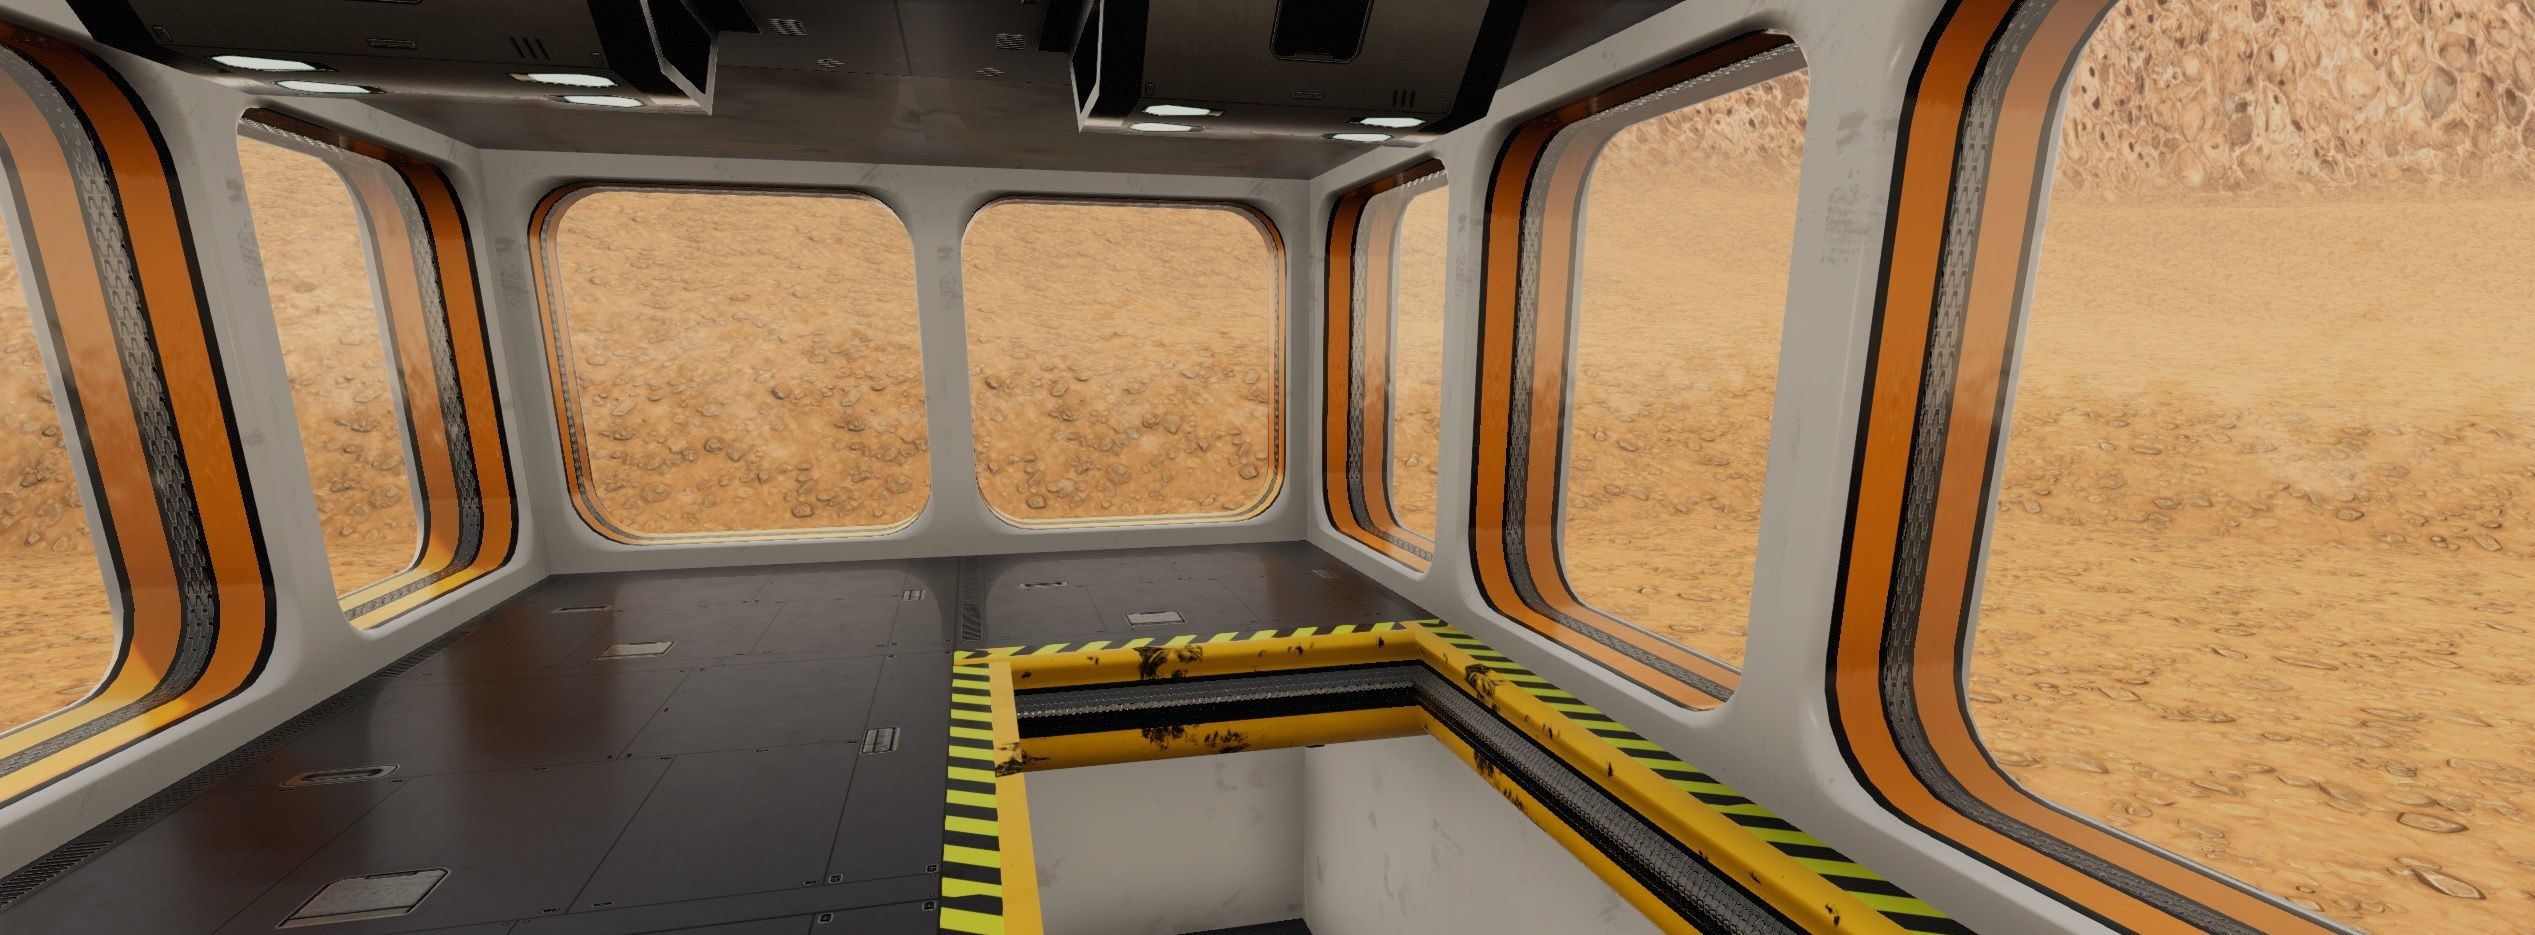 Modular Sci-fi Kit update